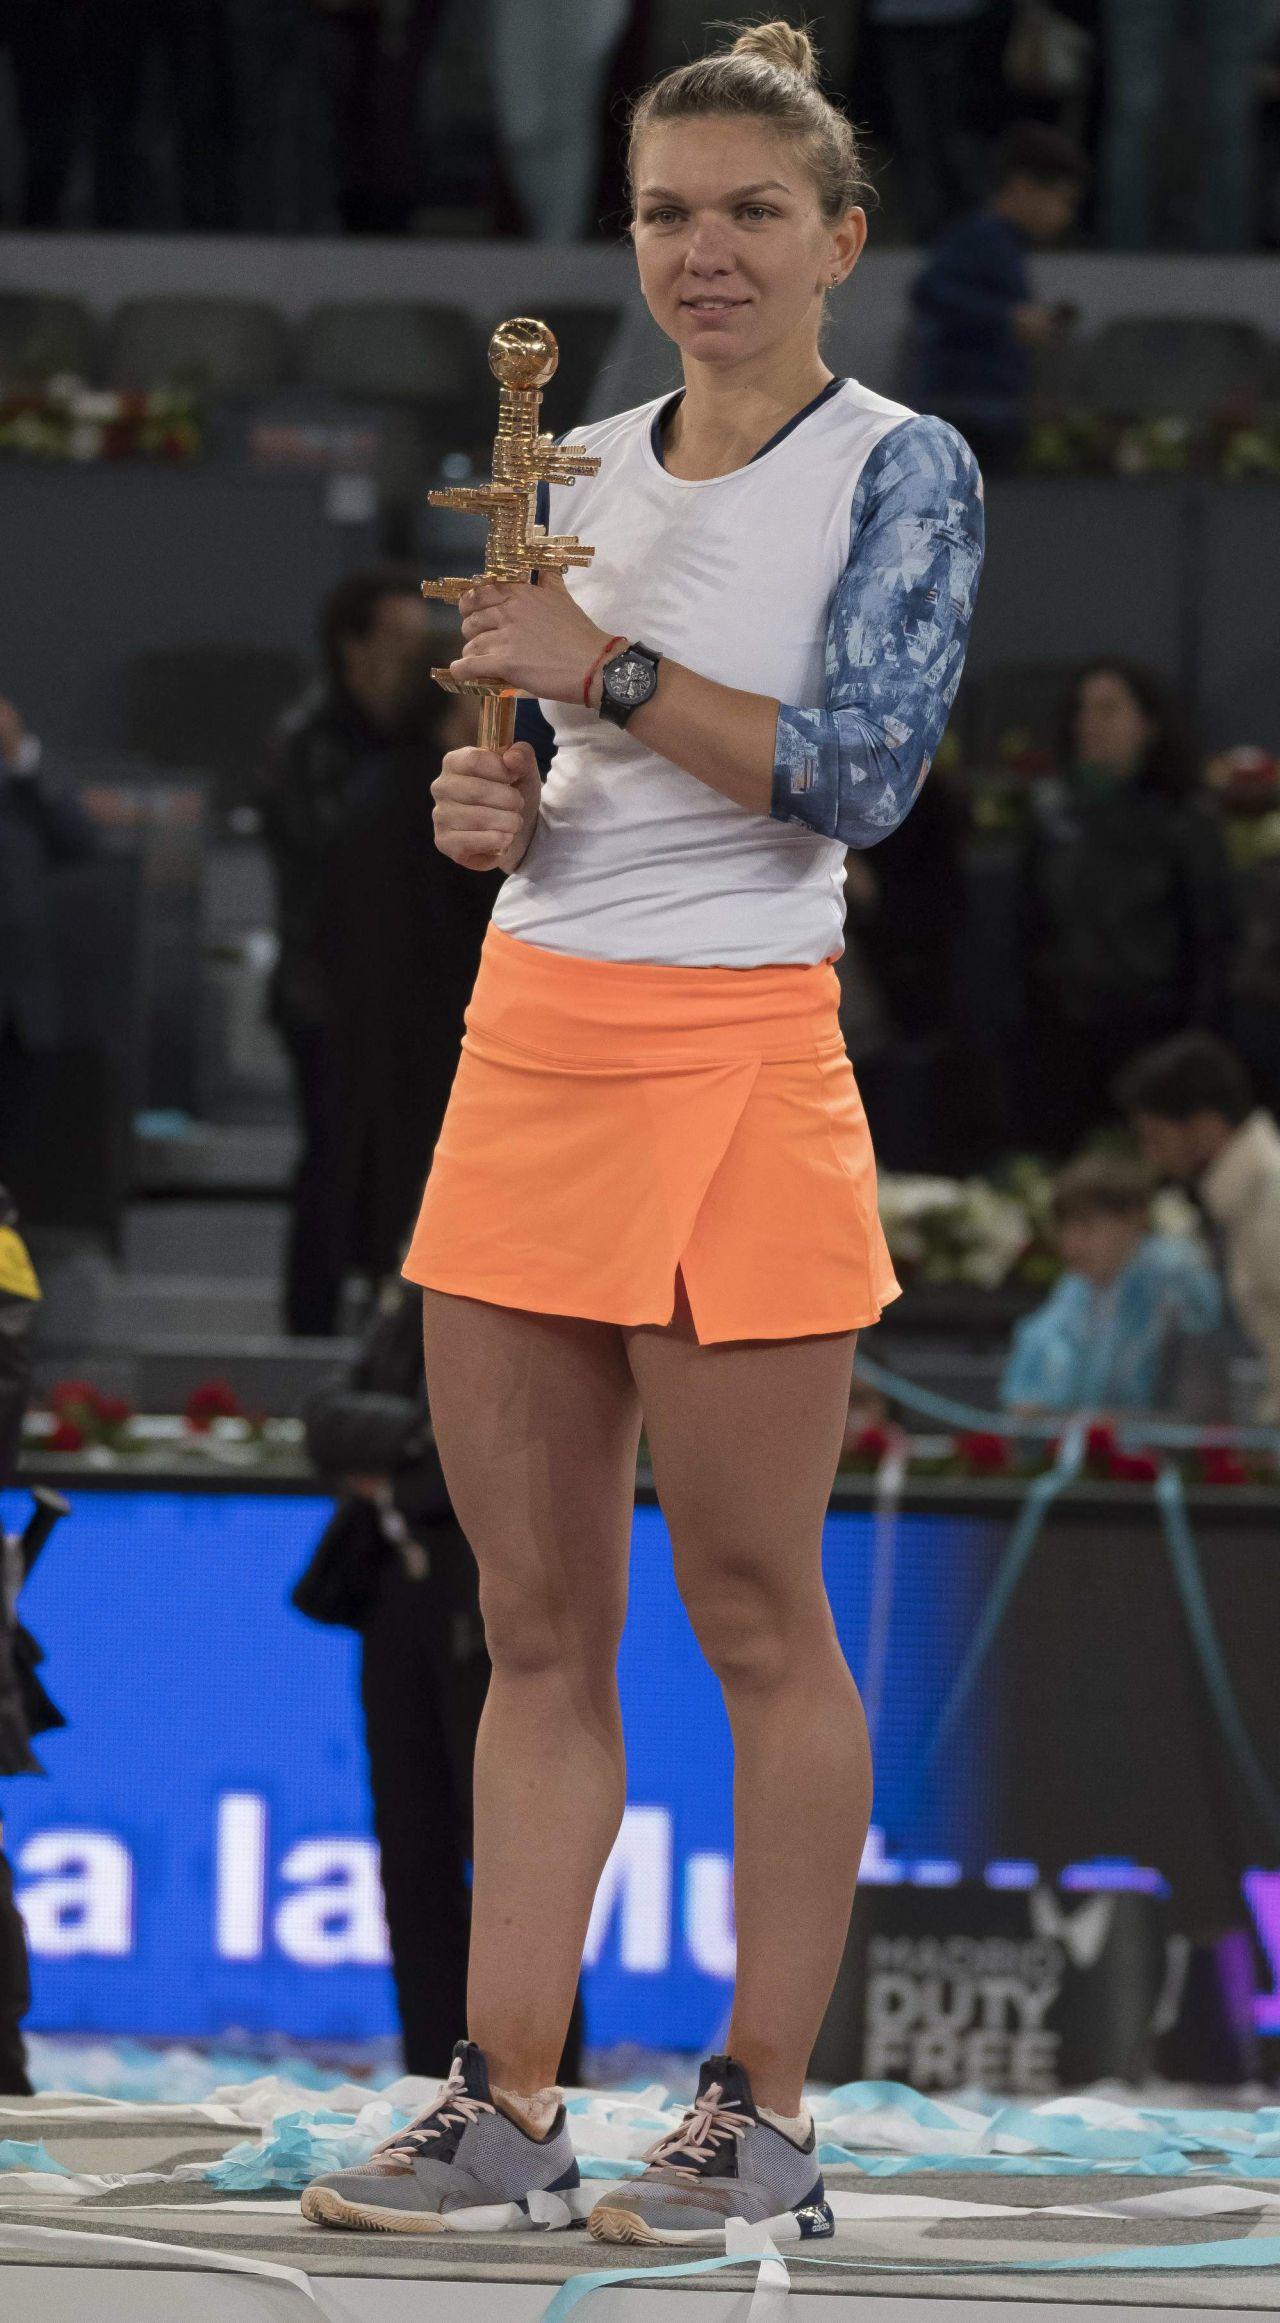 Simona Halep – Mutua Madrid Open Tennis, May 2017 Jessica Chastain